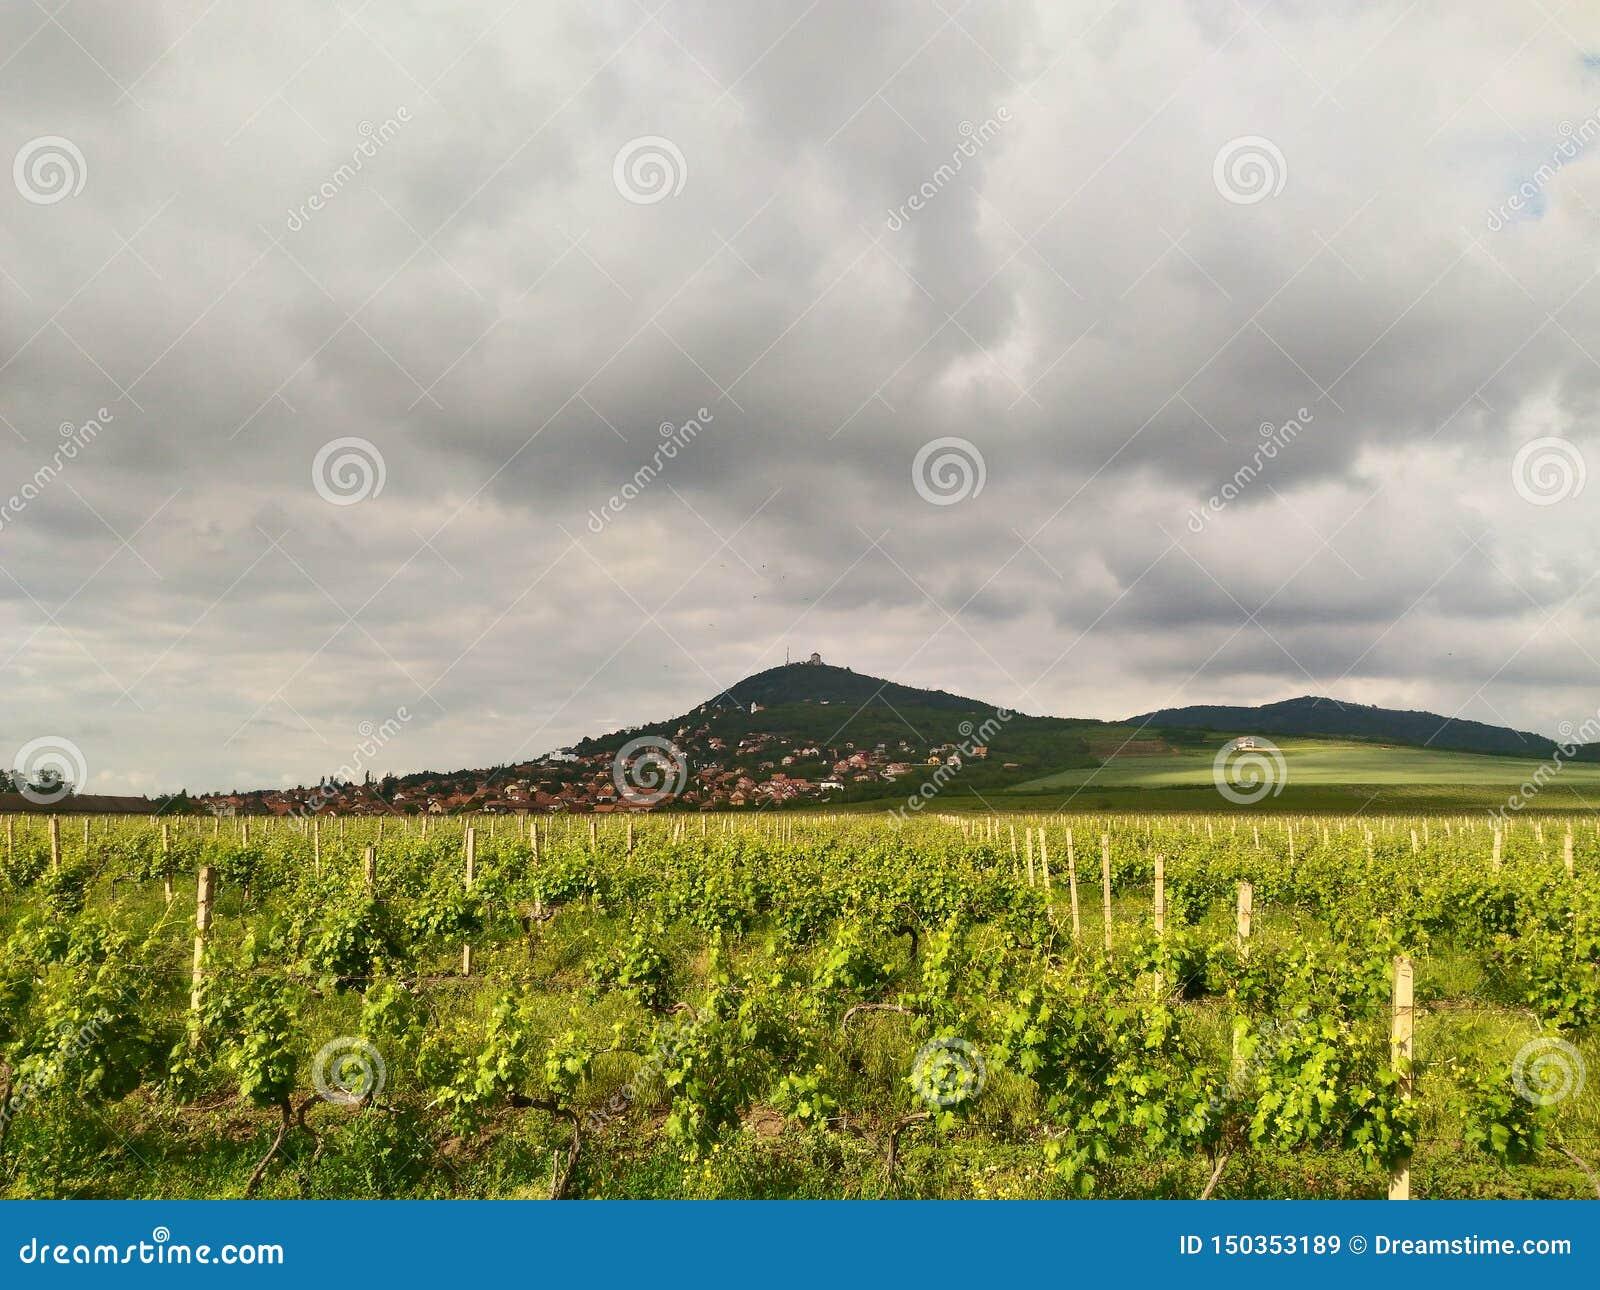 Podnozje Vrsackih planina, Vrsacka kula